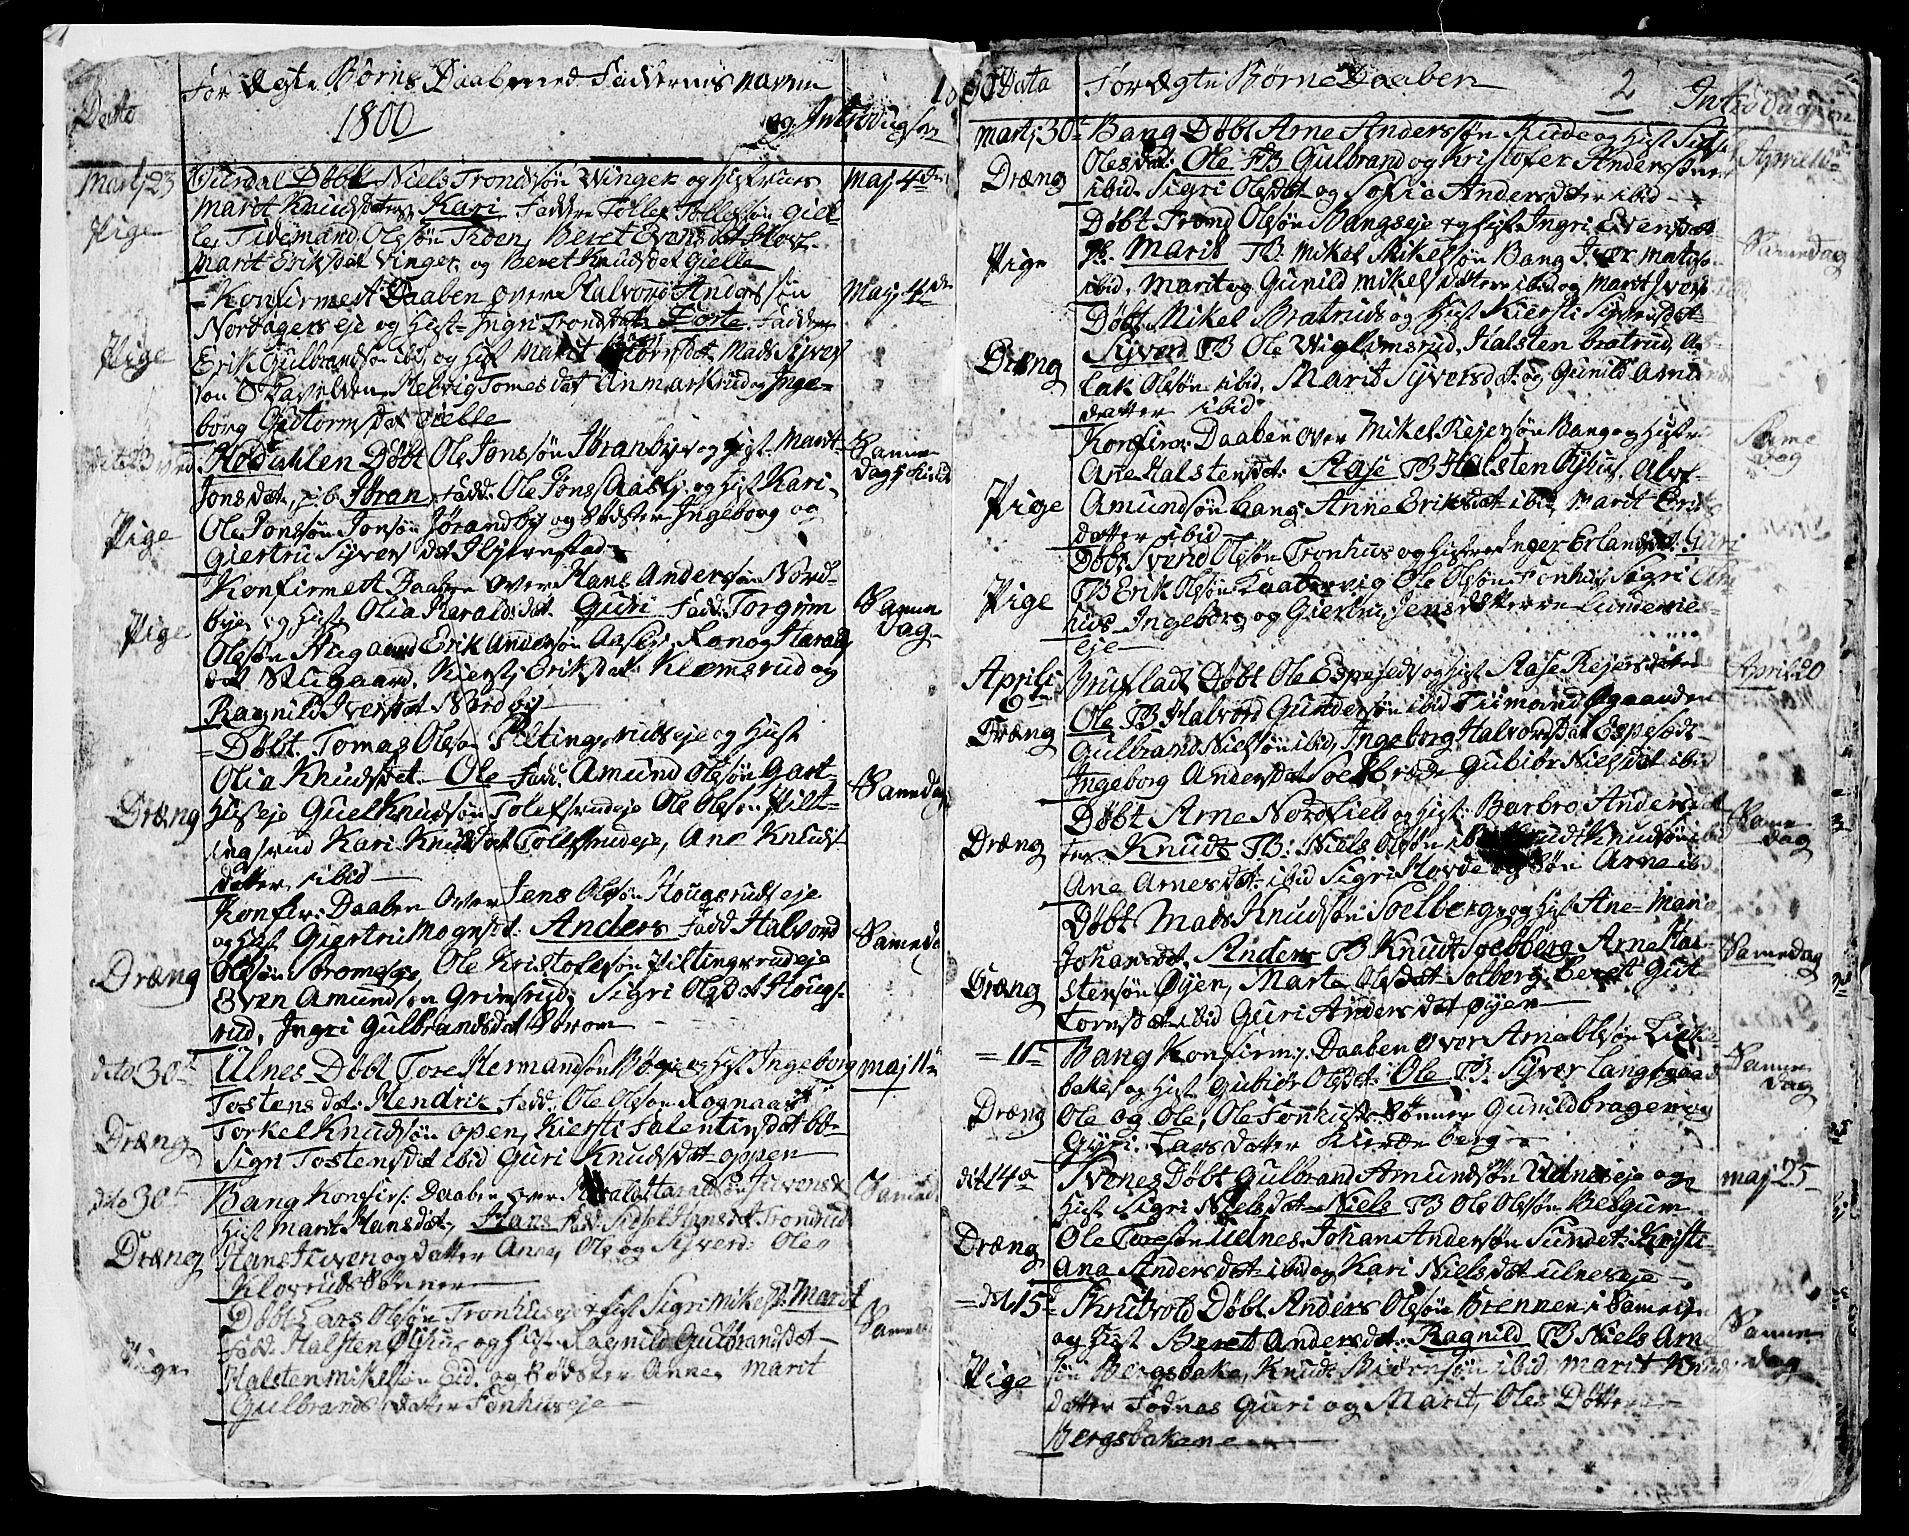 SAH, Aurdal prestekontor, Ministerialbok nr. 7, 1800-1808, s. 2